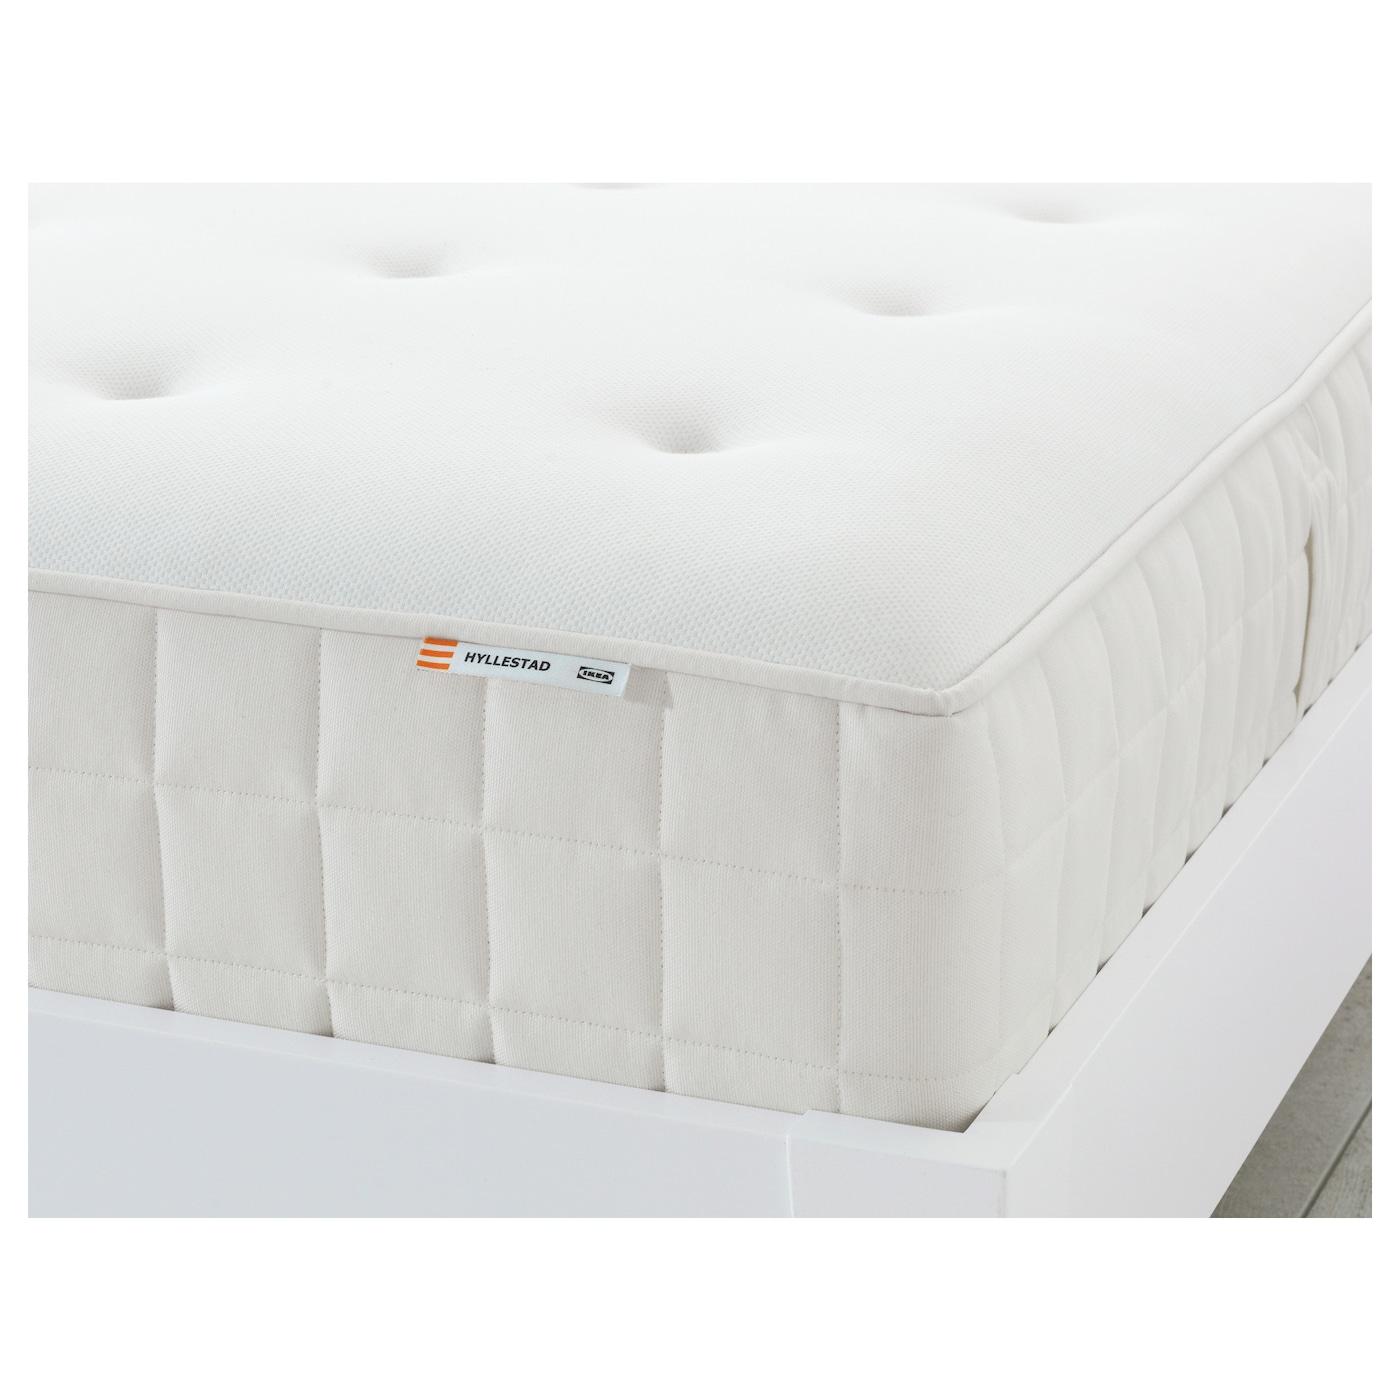 hyllestad matelas ressorts ensach s ferme blanc 140x200. Black Bedroom Furniture Sets. Home Design Ideas